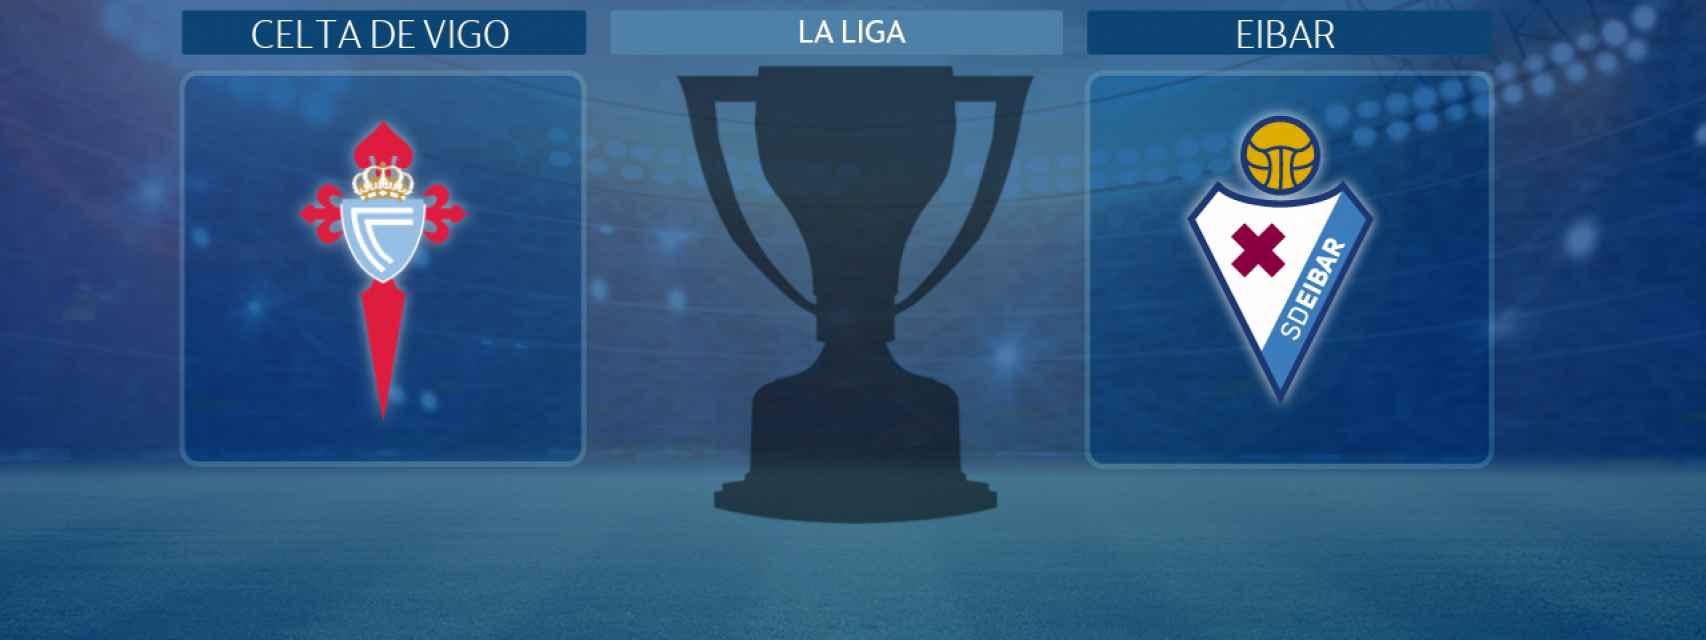 Celta de Vigo - Eibar, partido de La Liga